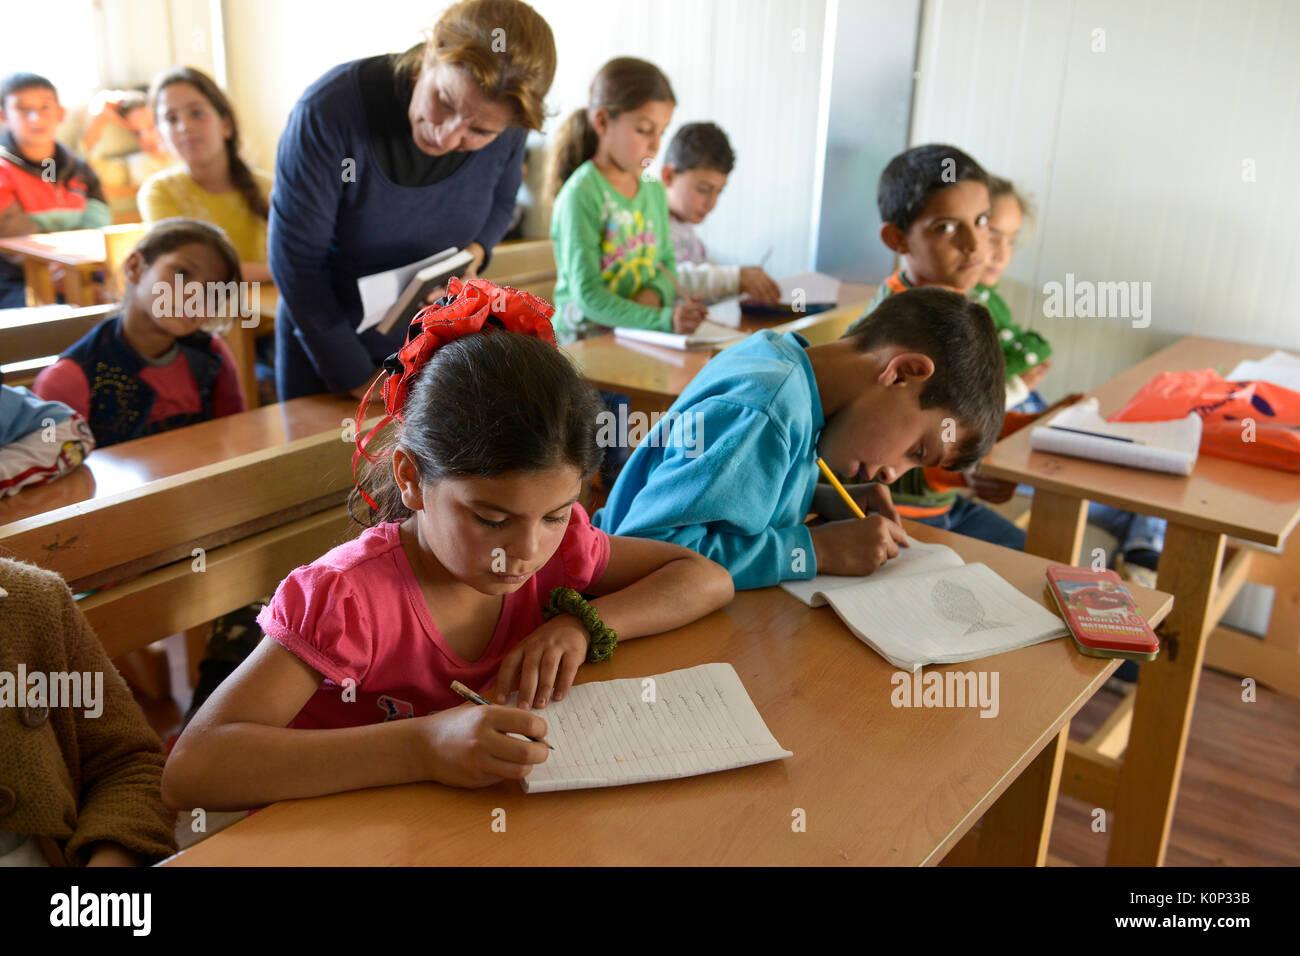 LEBANON Deir el Ahmad, a maronite christian village in Beqaa valley, school for syrian refugee children, school of Good Shepherds Sisters of maronite church - Stock Image